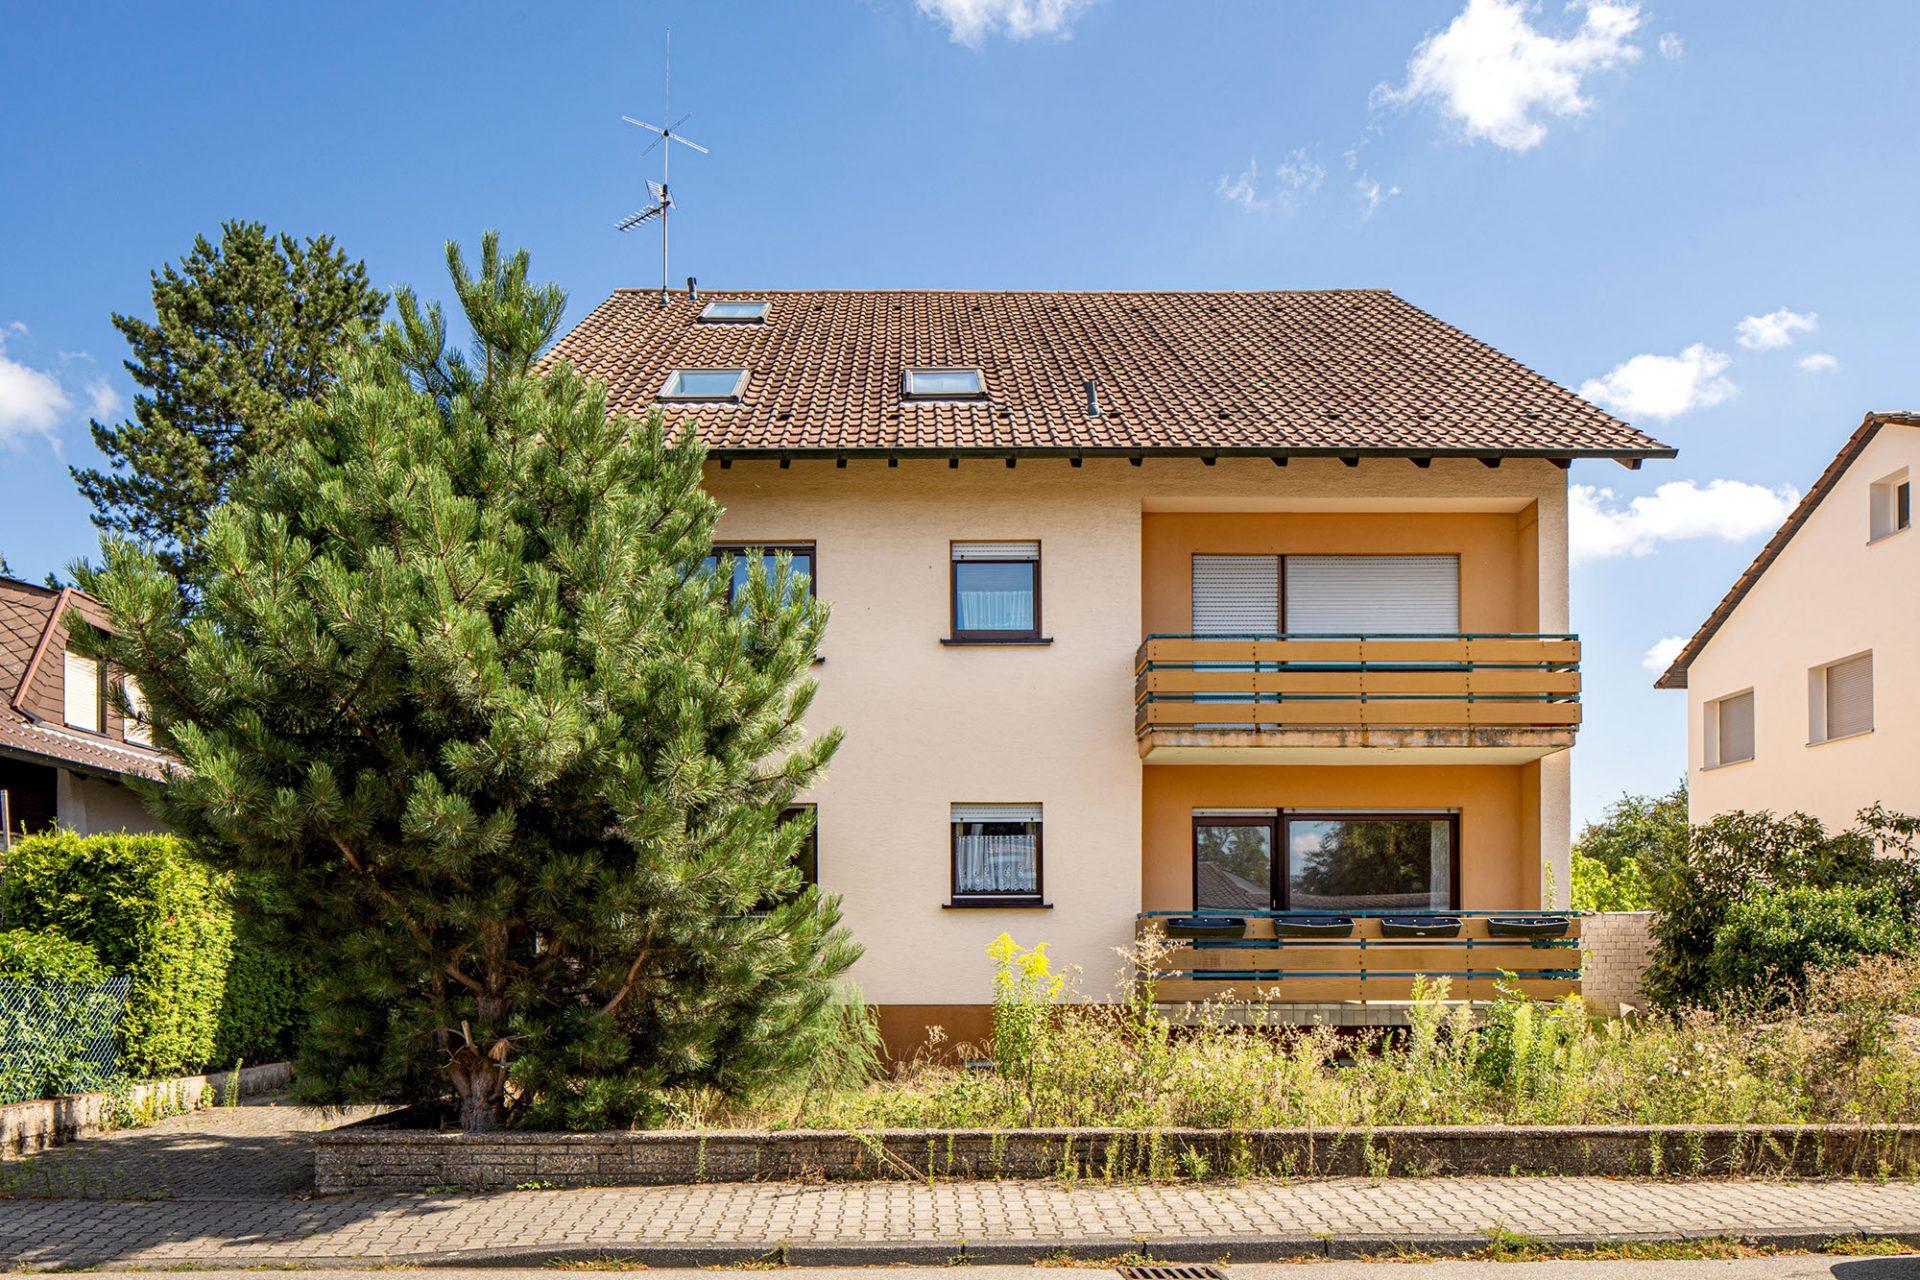 Immobilienfotografie in Mannheim © Offenblende / Lys LYS